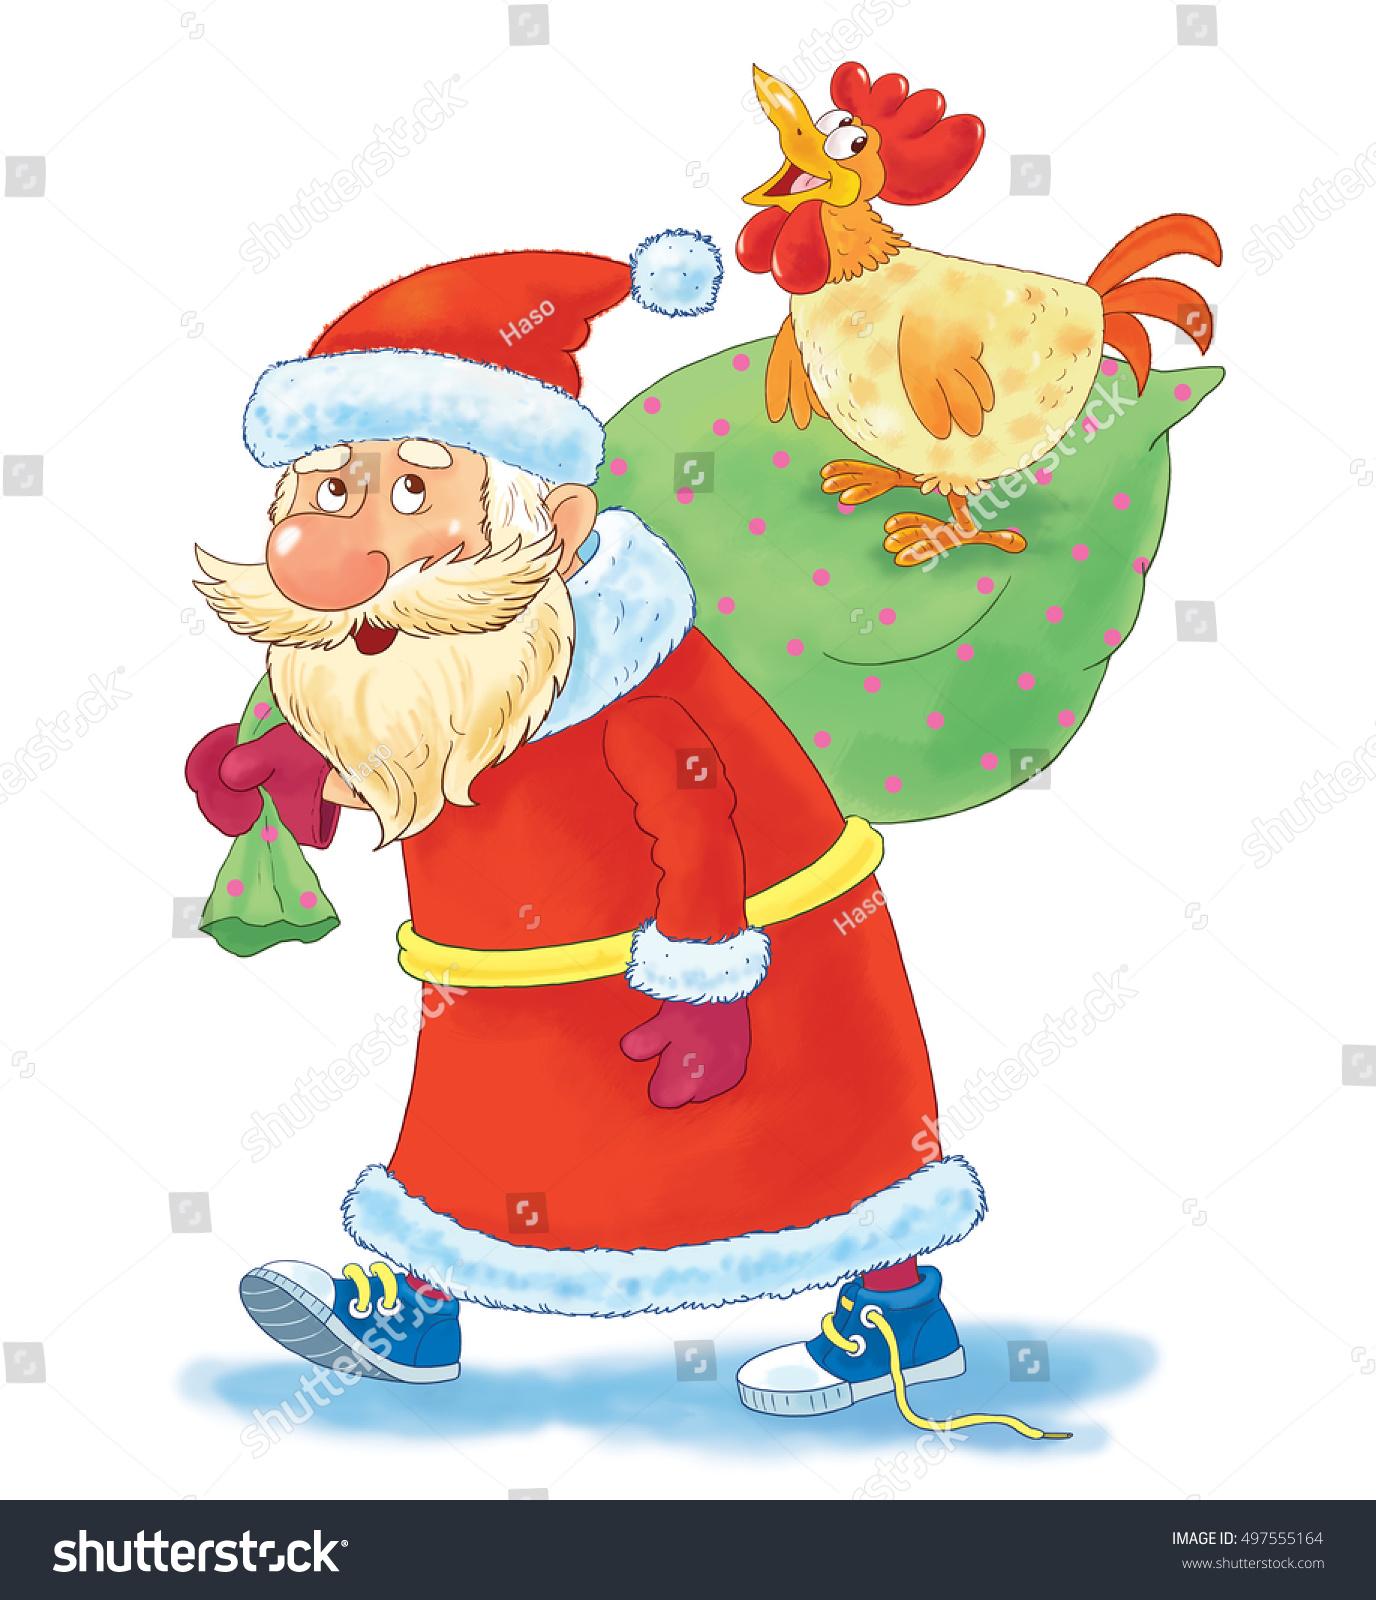 New 2017 Year Christmas Greeting Card Cute Funny Santa In